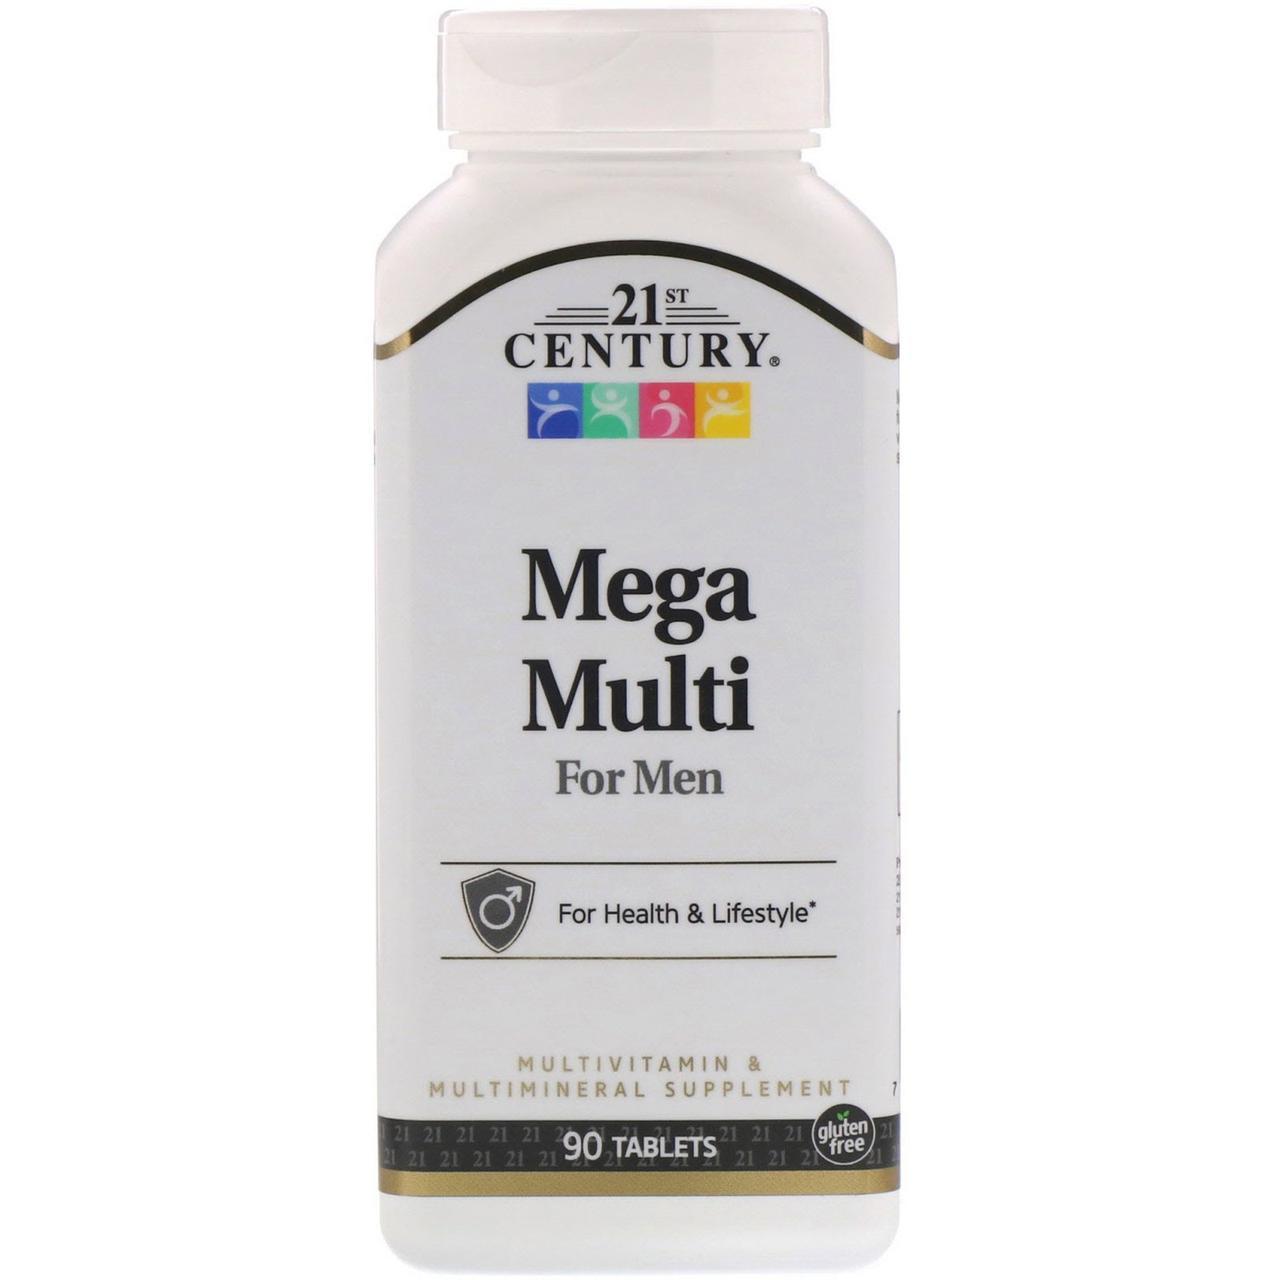 Мультивитамины и мультиминералы 21st Century, Mega Multi, для мужчин, 90 таблеток